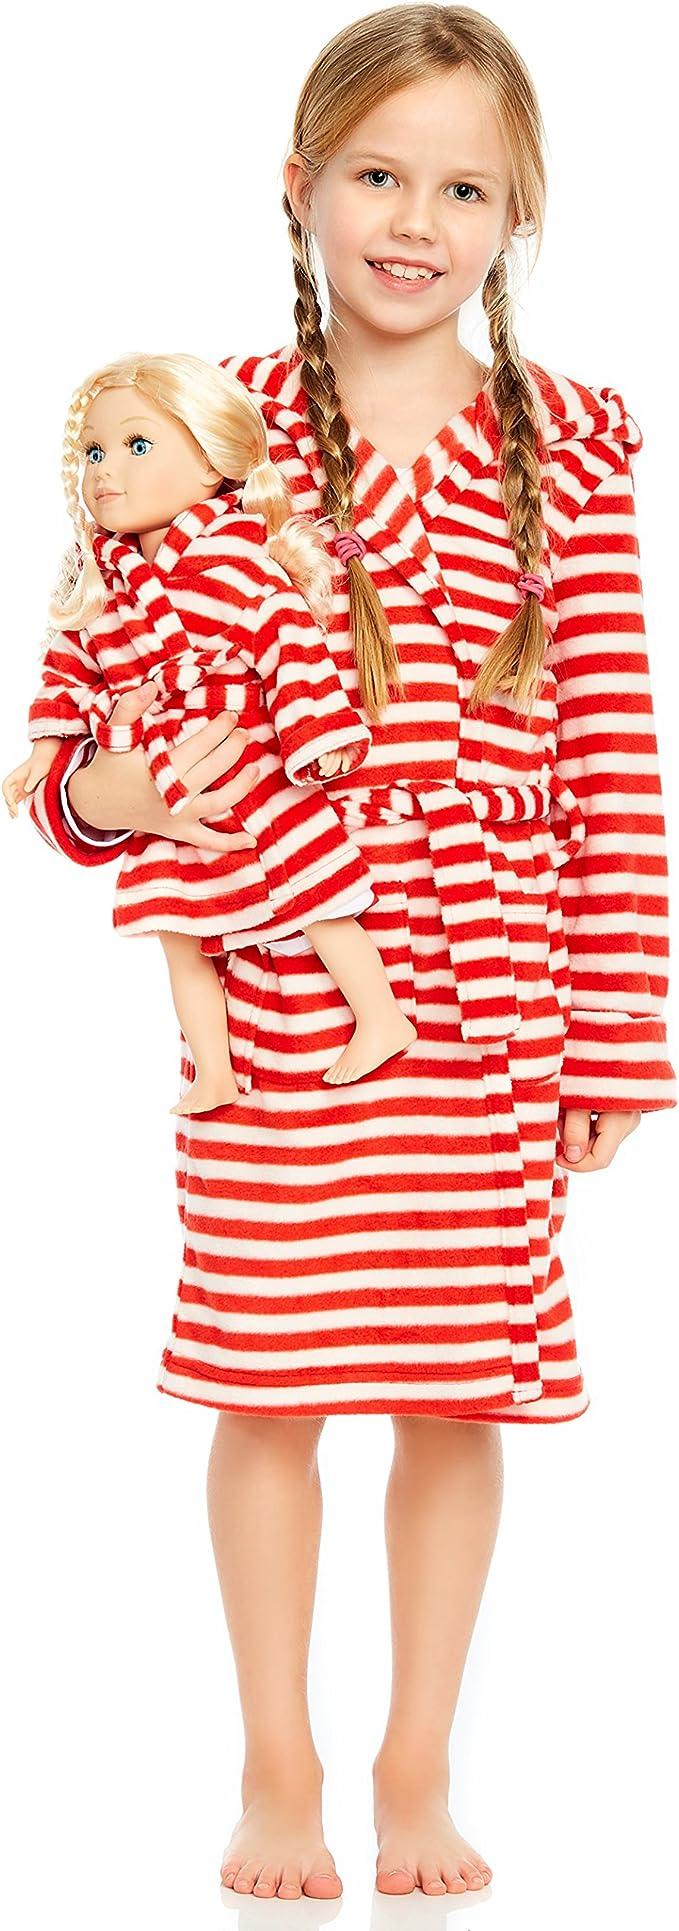 Leveret Boys Girls Red Fleece Sleep Robe Size 2 Toddler - 14Y